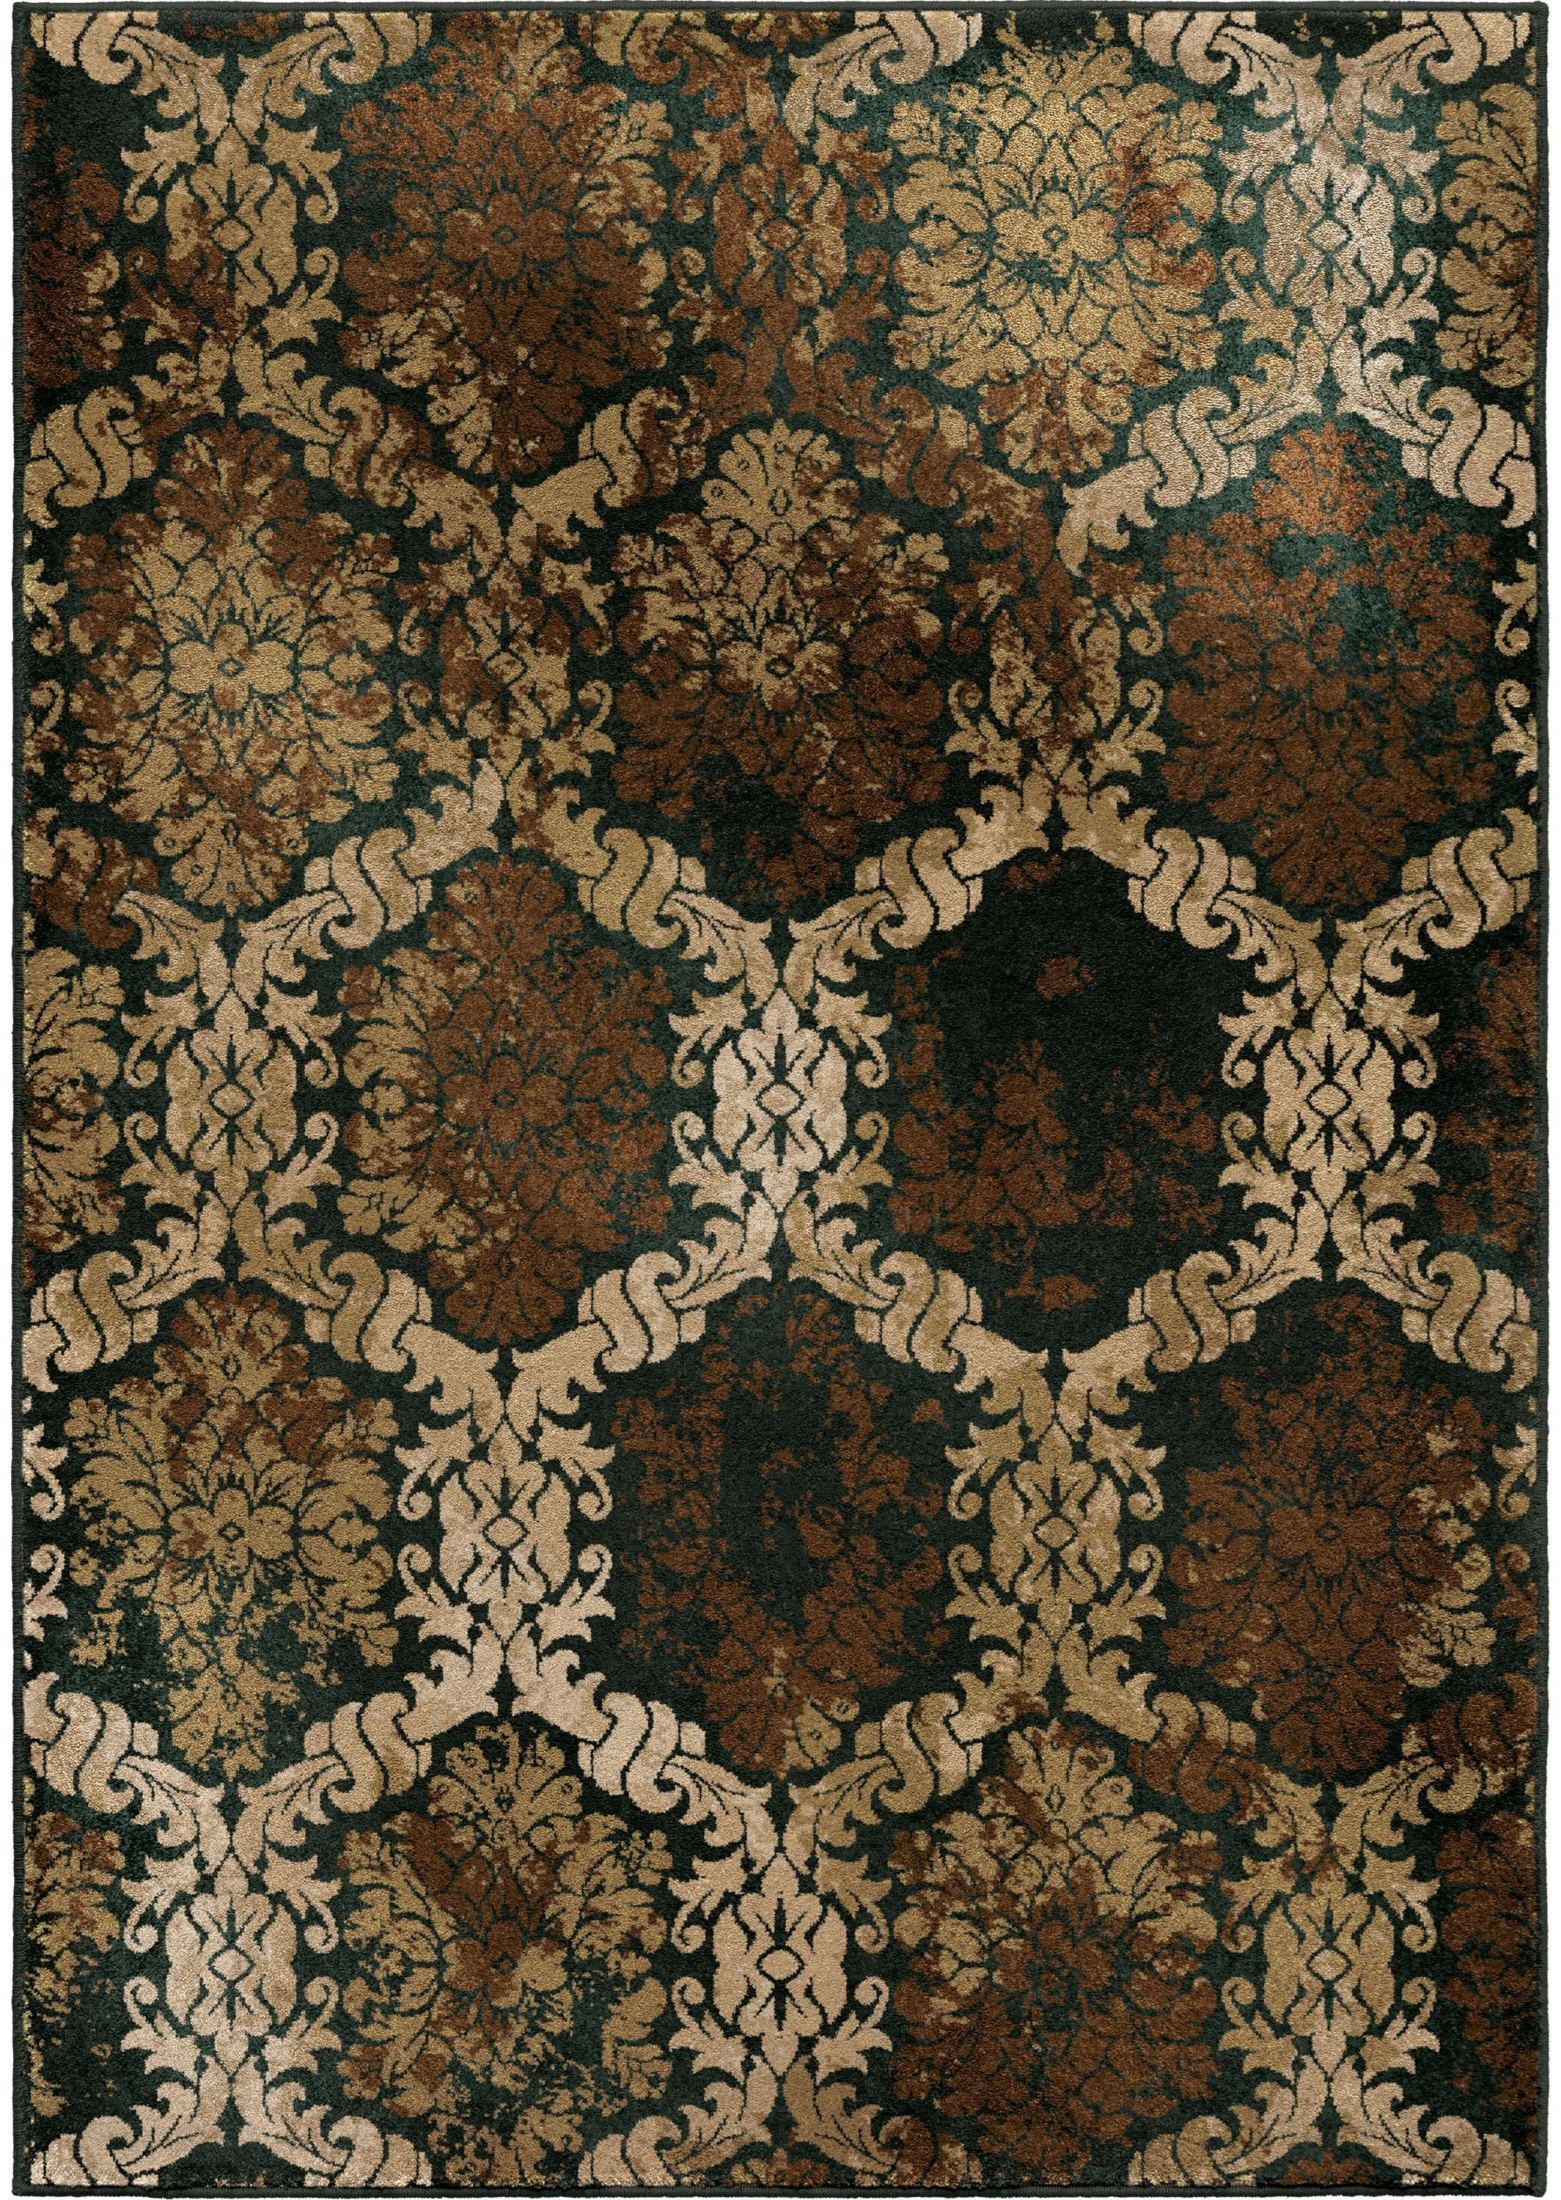 orian rugs insanely soft medallion scrolls oxfordburst. Black Bedroom Furniture Sets. Home Design Ideas